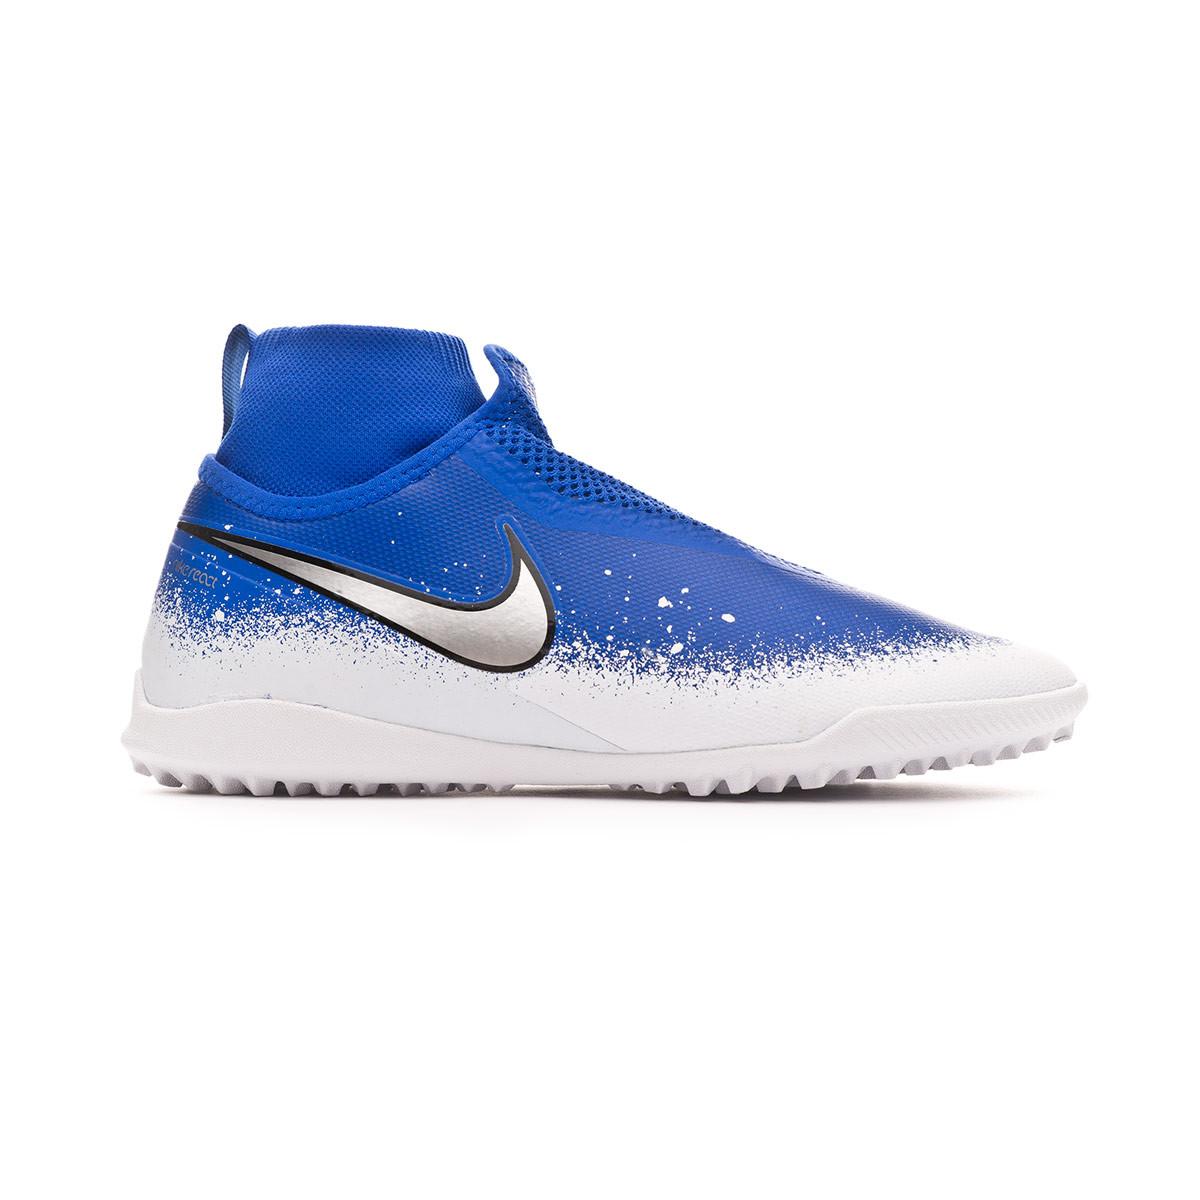 reloj captura zapatos deportivos Nike React Phantom Vision Pro DF Turf Football Boot